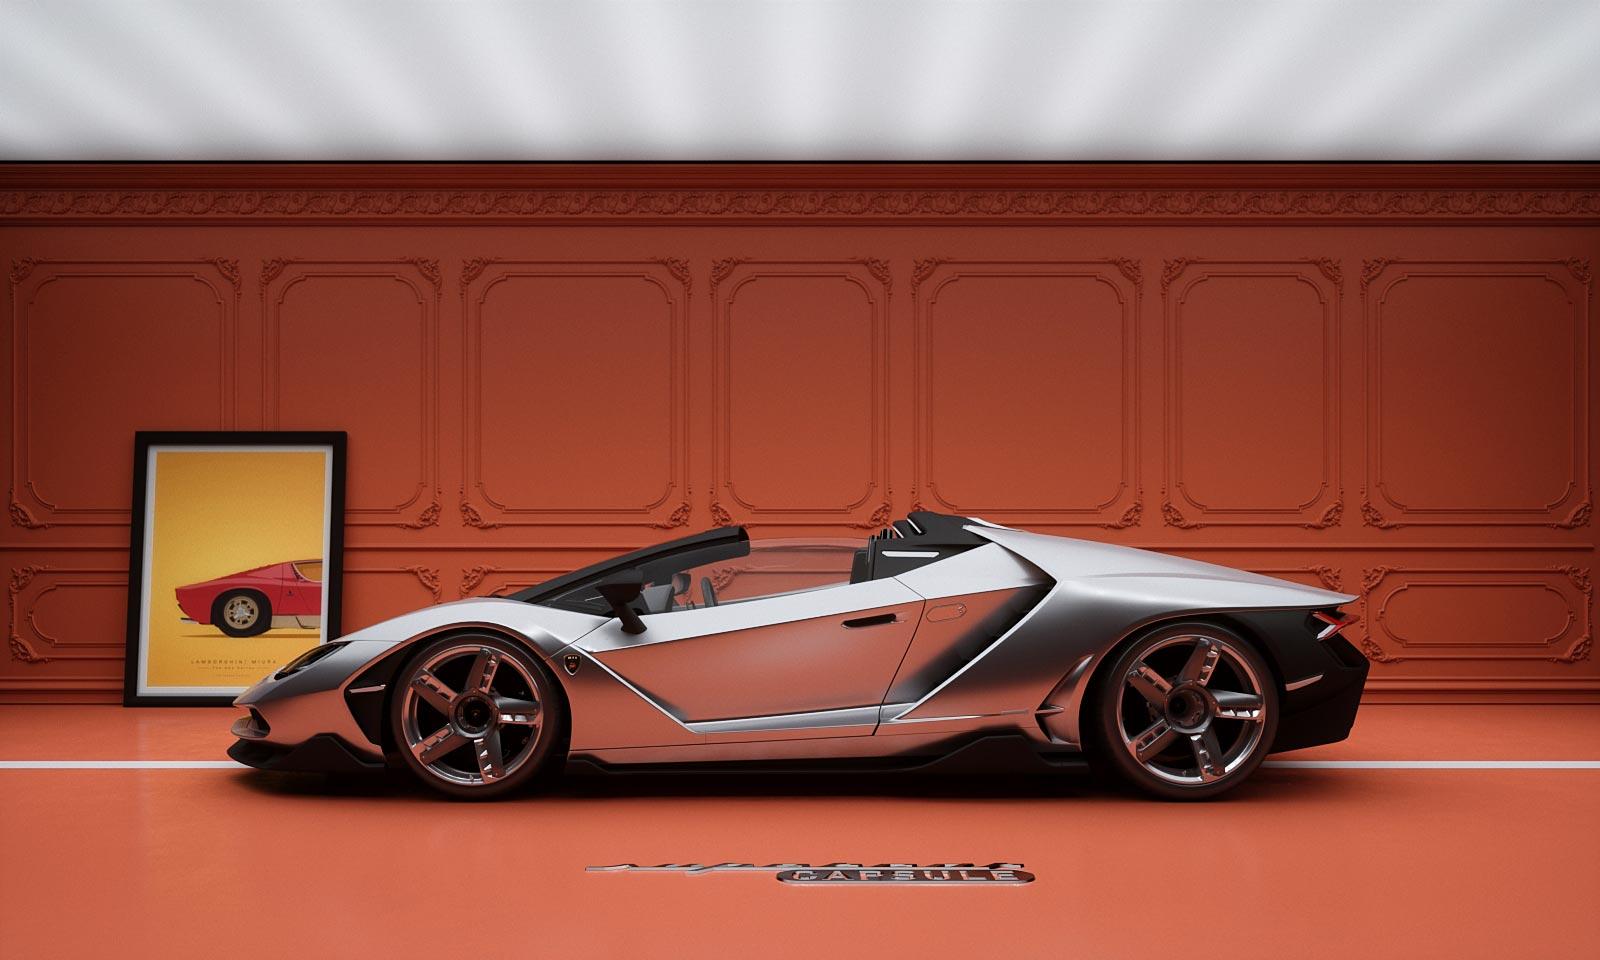 Supercar-Capsule-by-ASZarchitetti-Group-9